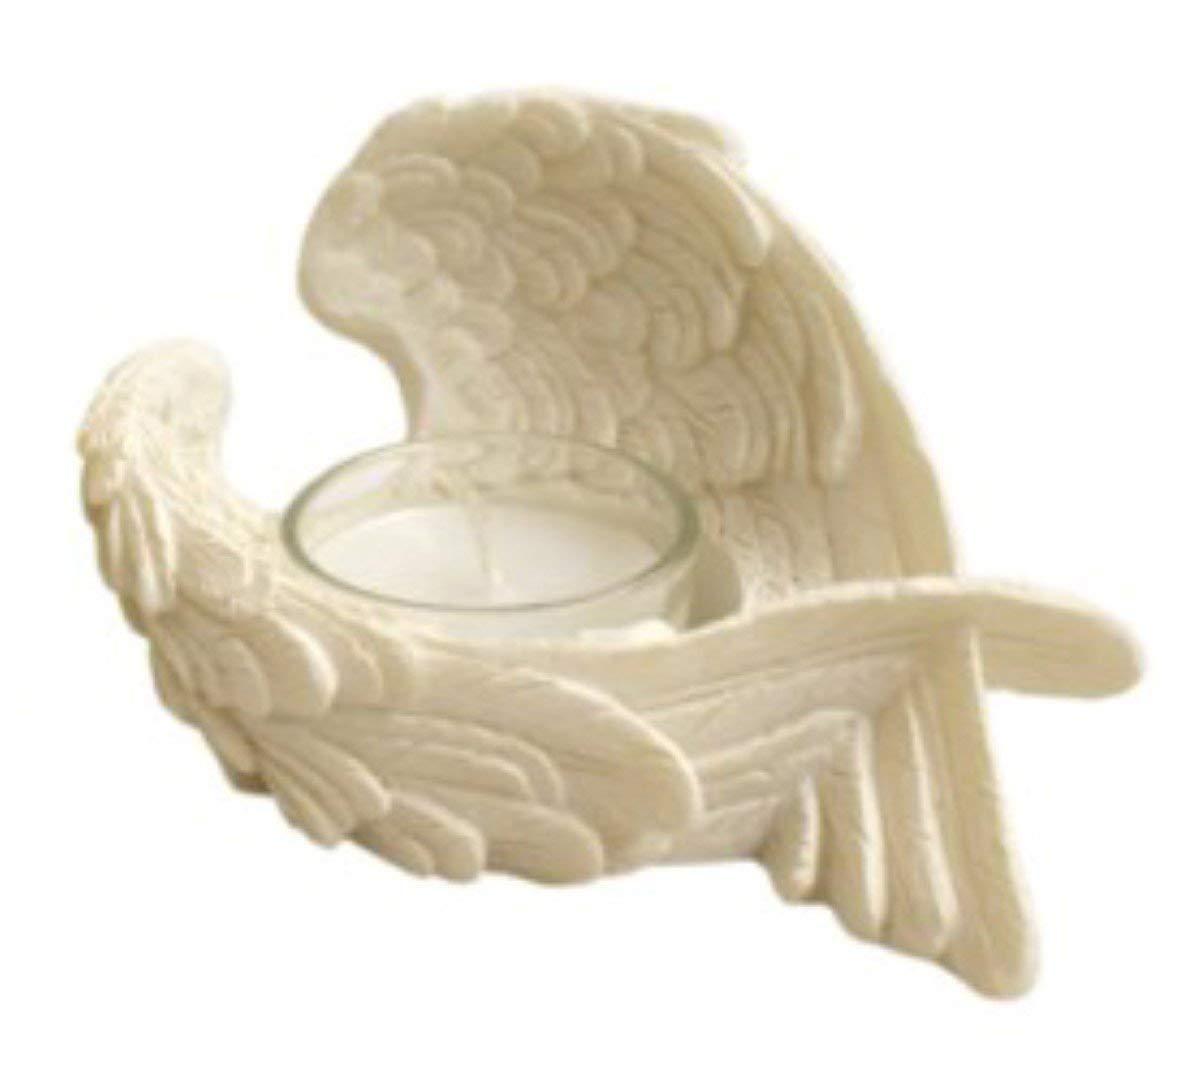 lotusandlime Winged White Angel Resin and Glass Votive Holder